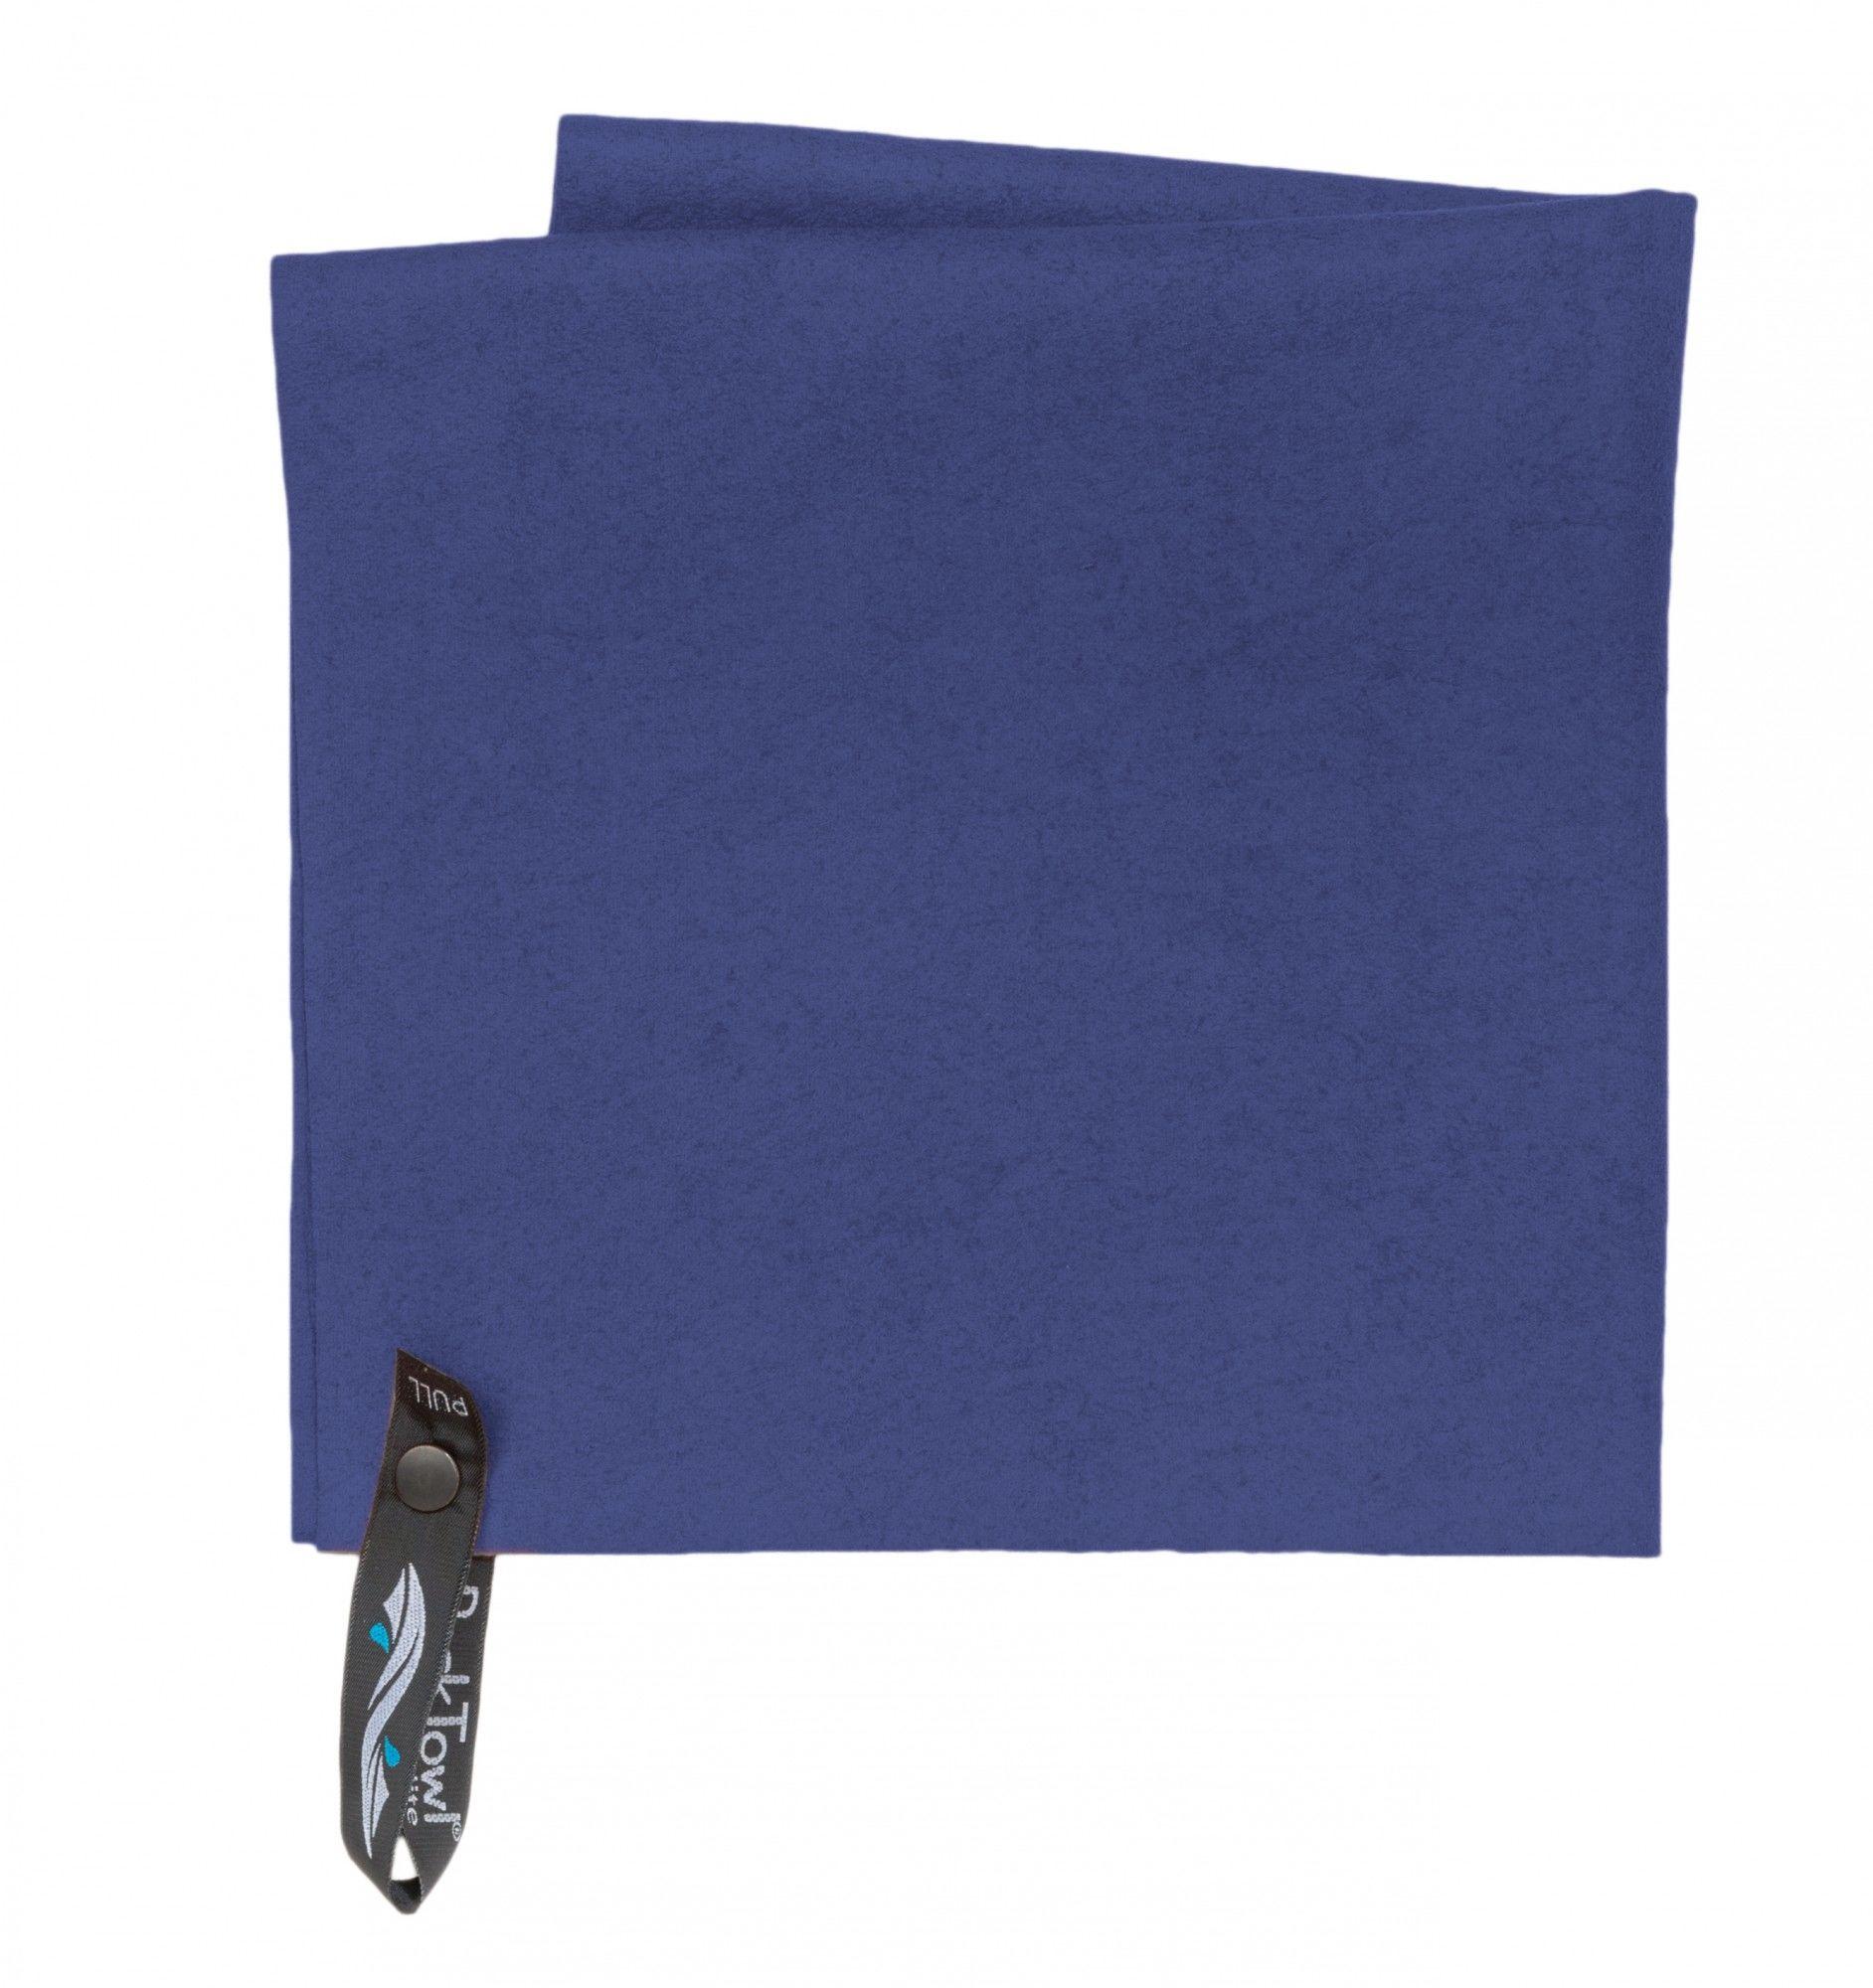 PackTowl Ultralite L-Hand Blau, Outdoor-Hygiene, One Size